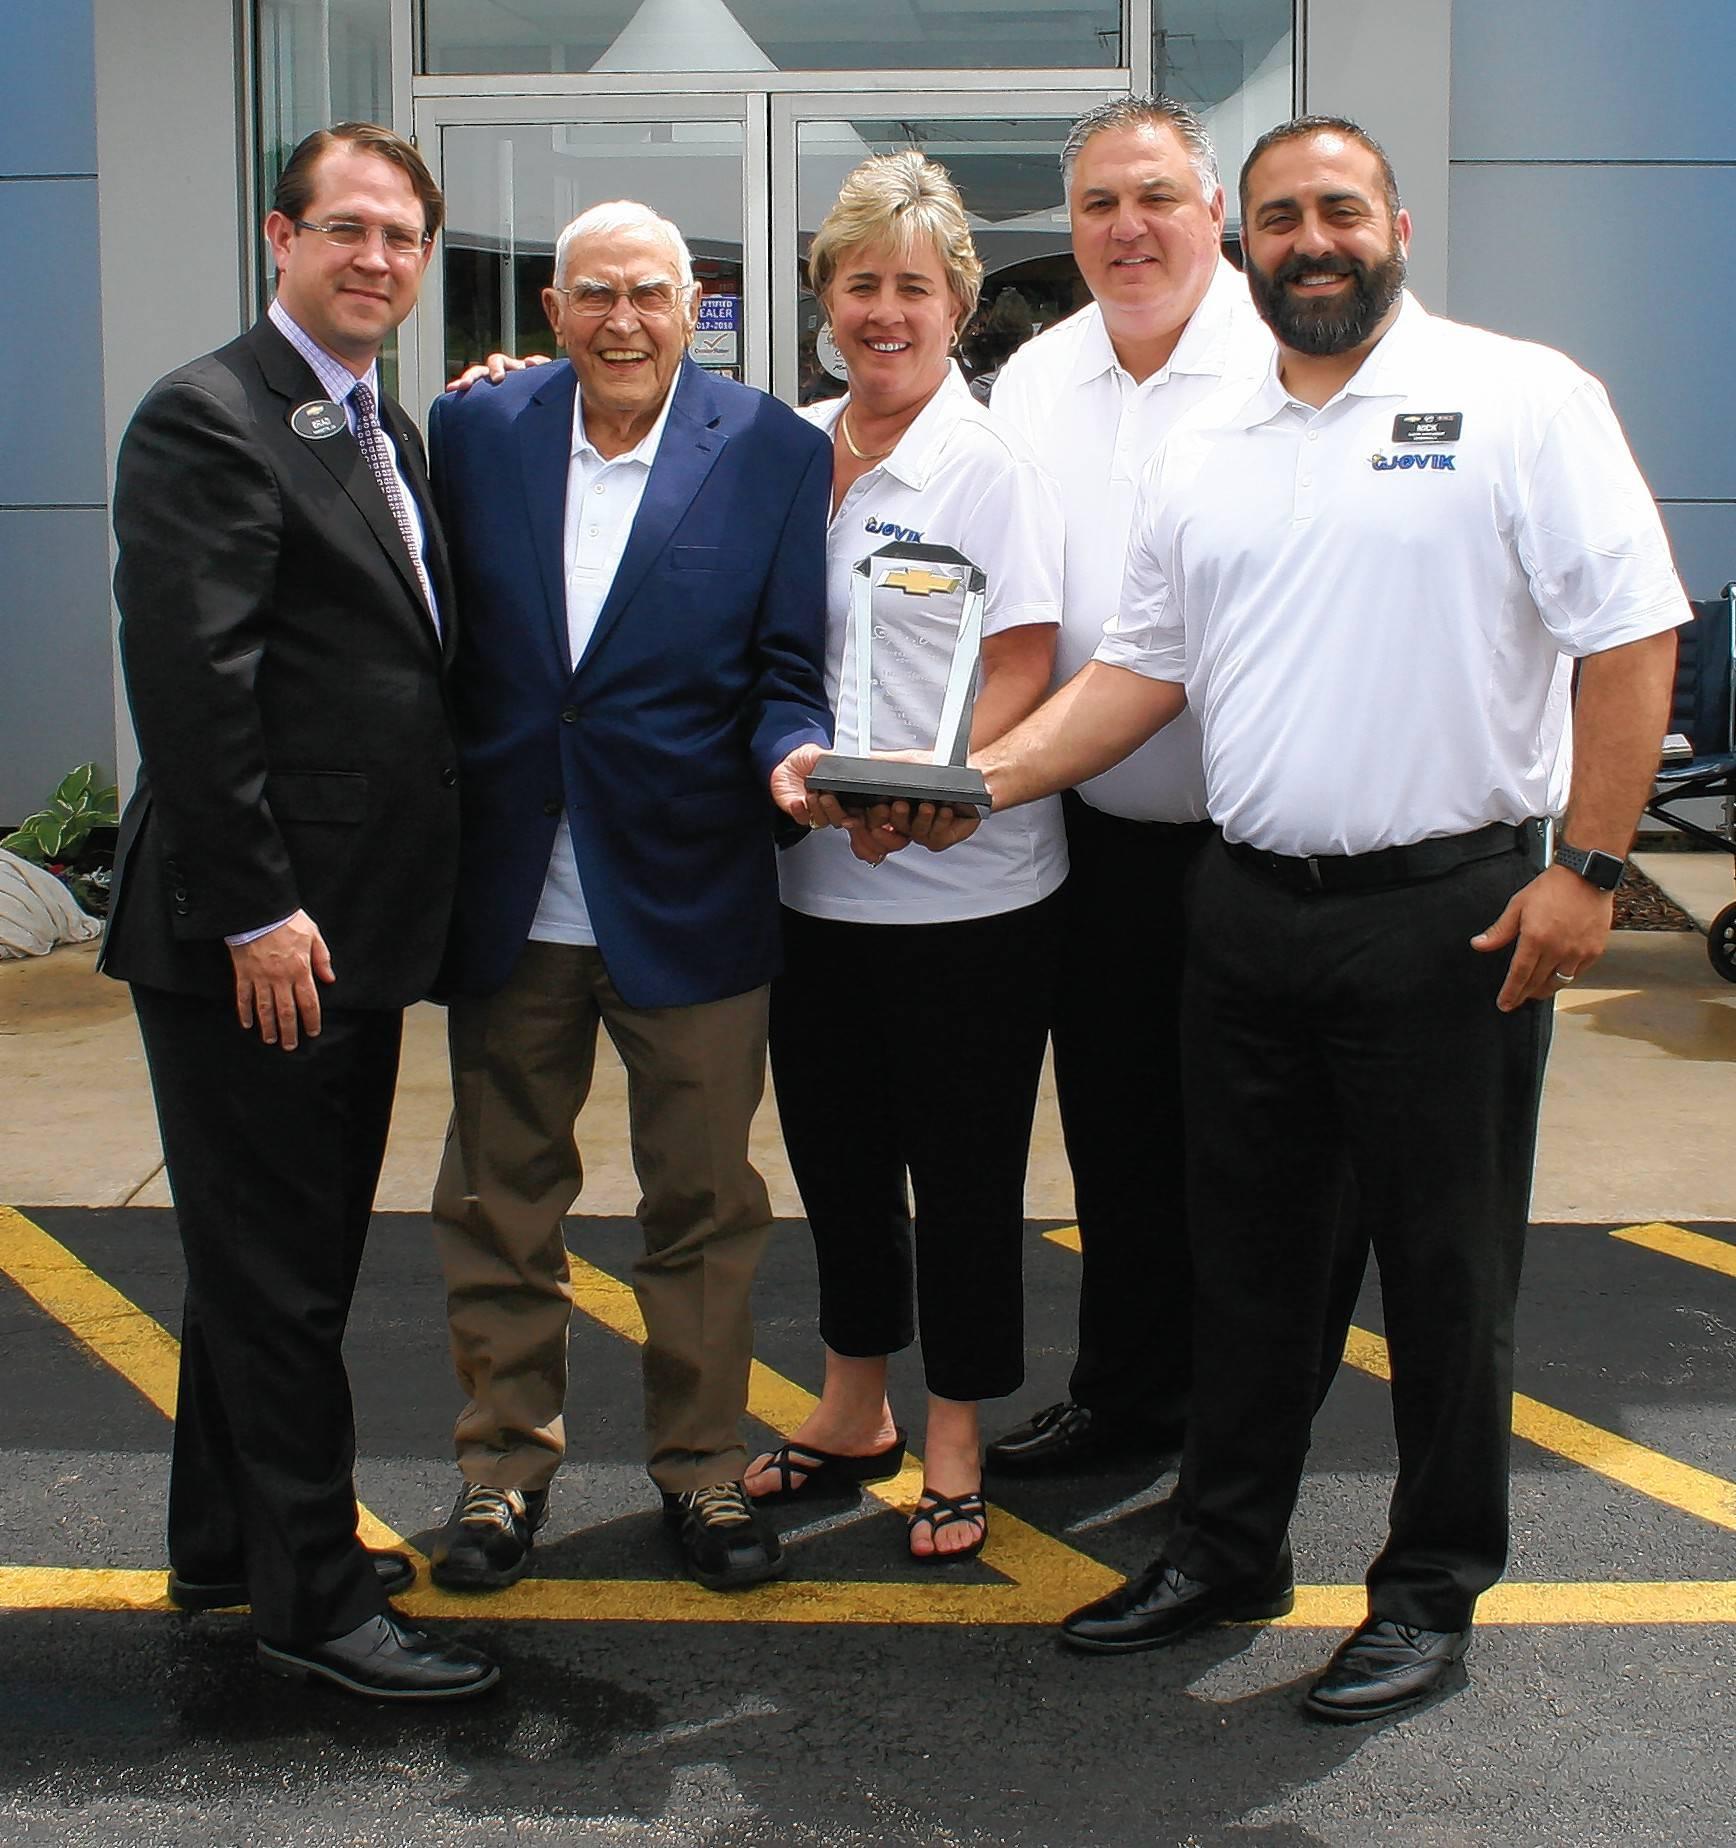 present 50 år man Gjovik Chevrolet celebrates 50 years present 50 år man